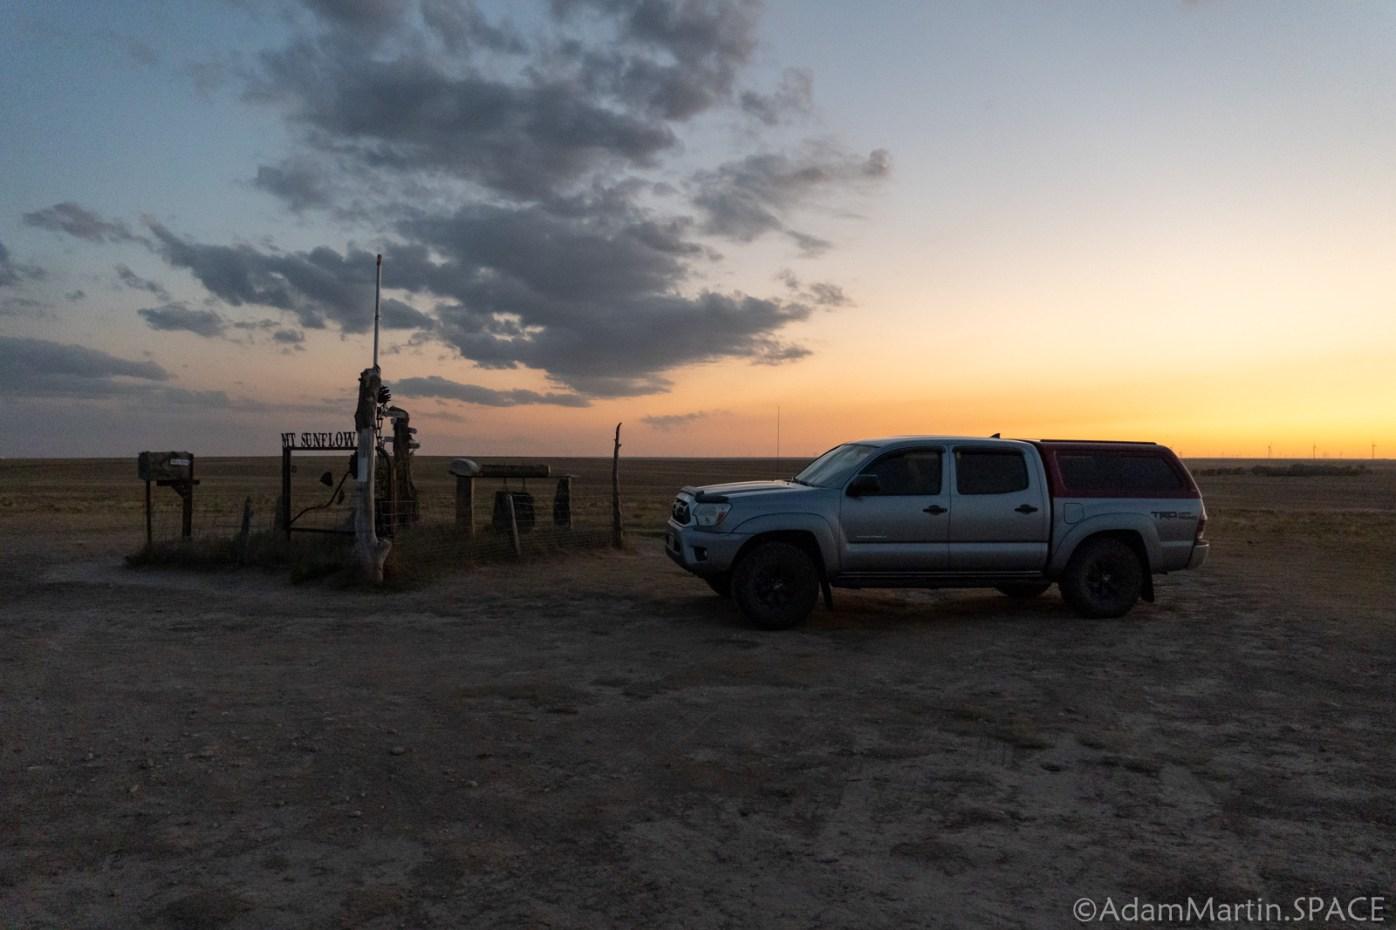 Mount Sunflower - Gratuitous Toyota Tacoma Sunset Photo